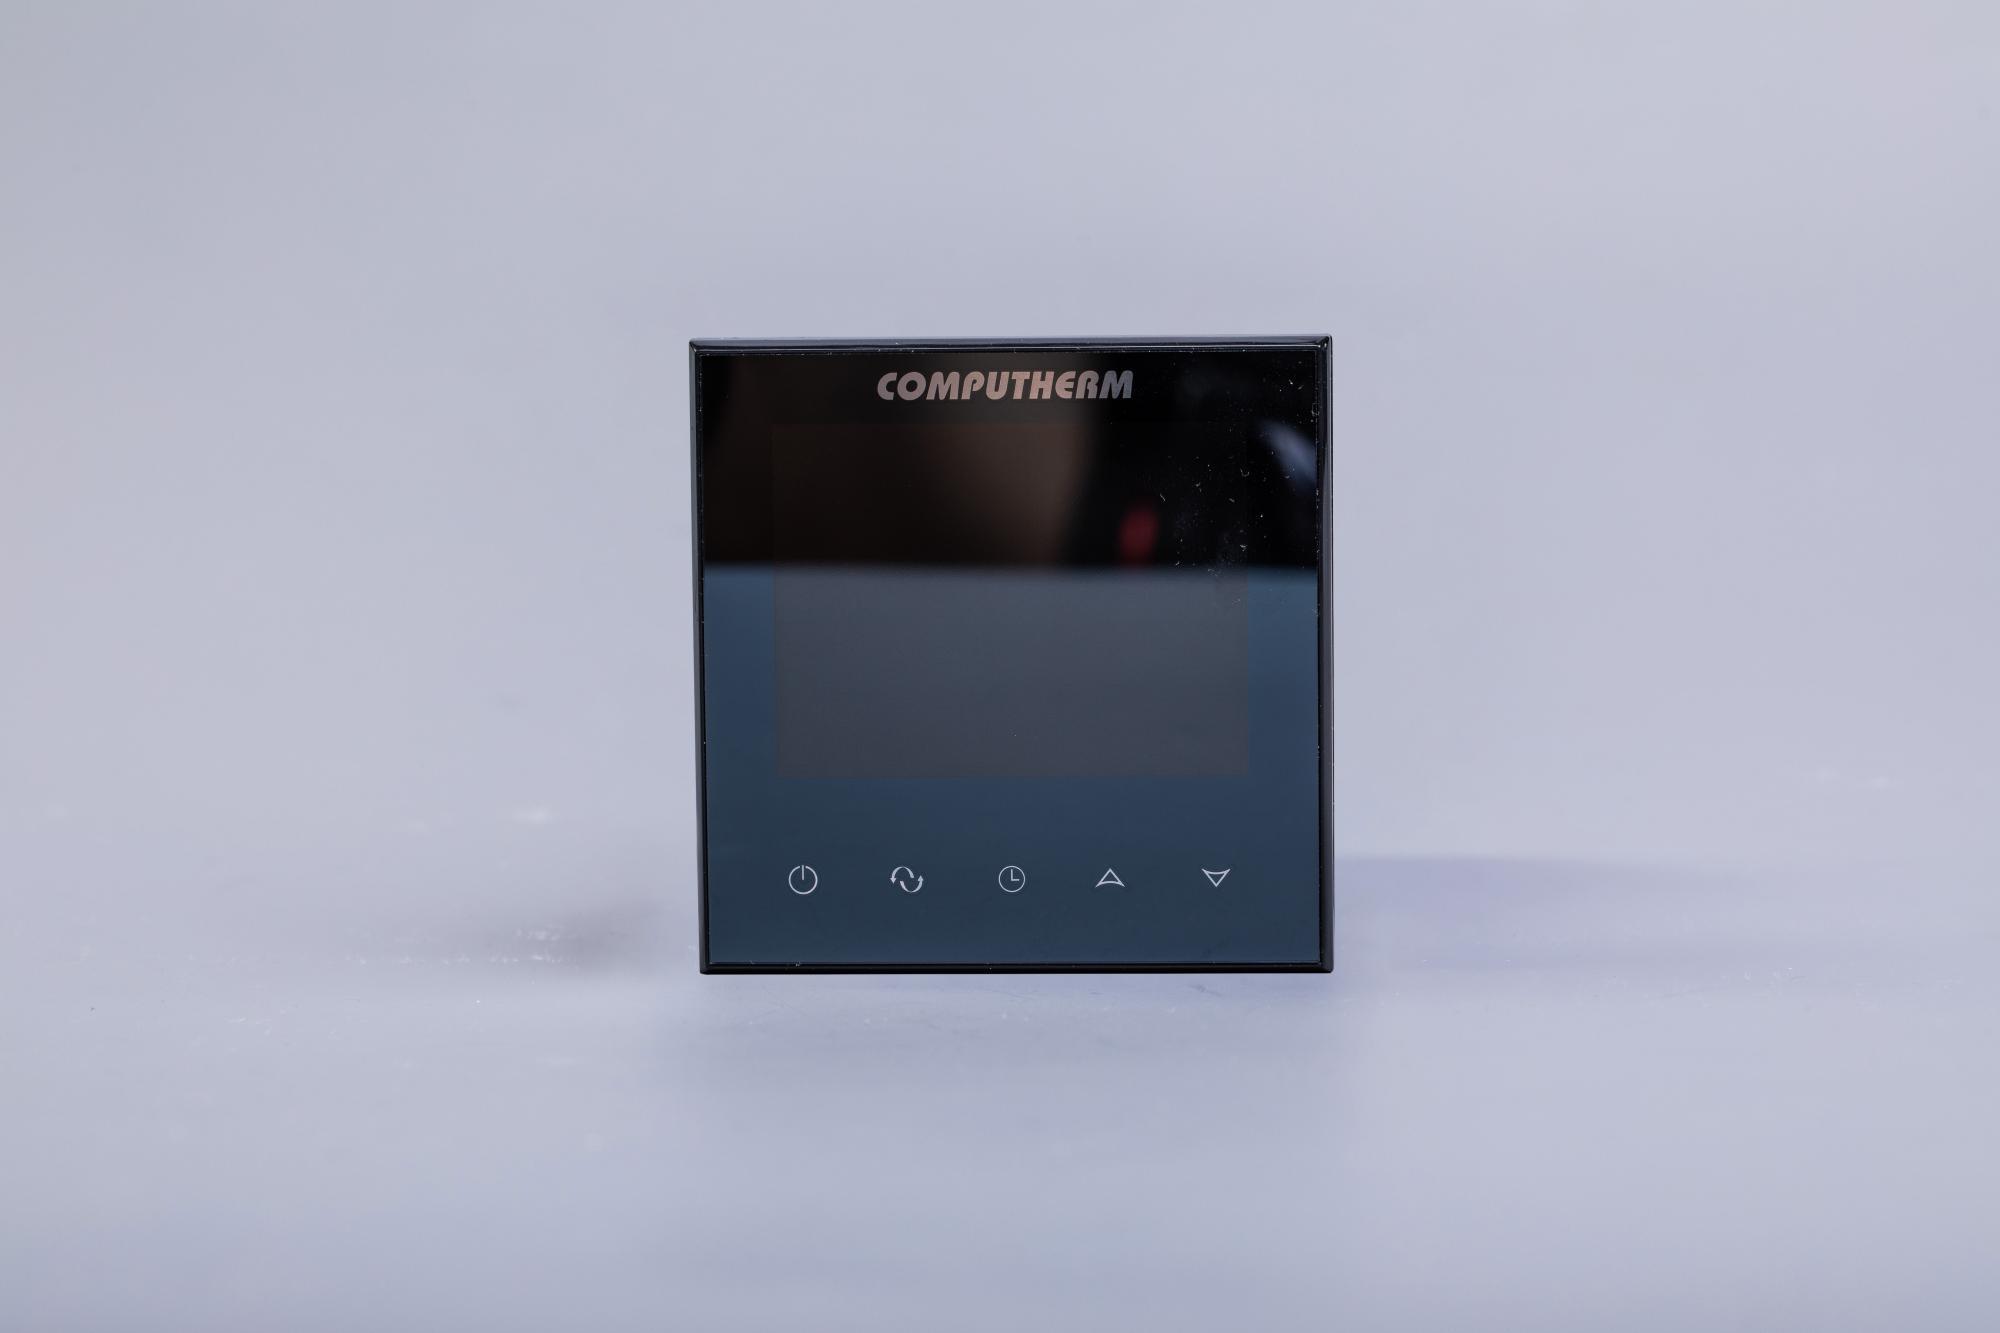 Computherm - Wi-fi termosztátok -  COMPUTHERM E300 - Quantrax Kft.